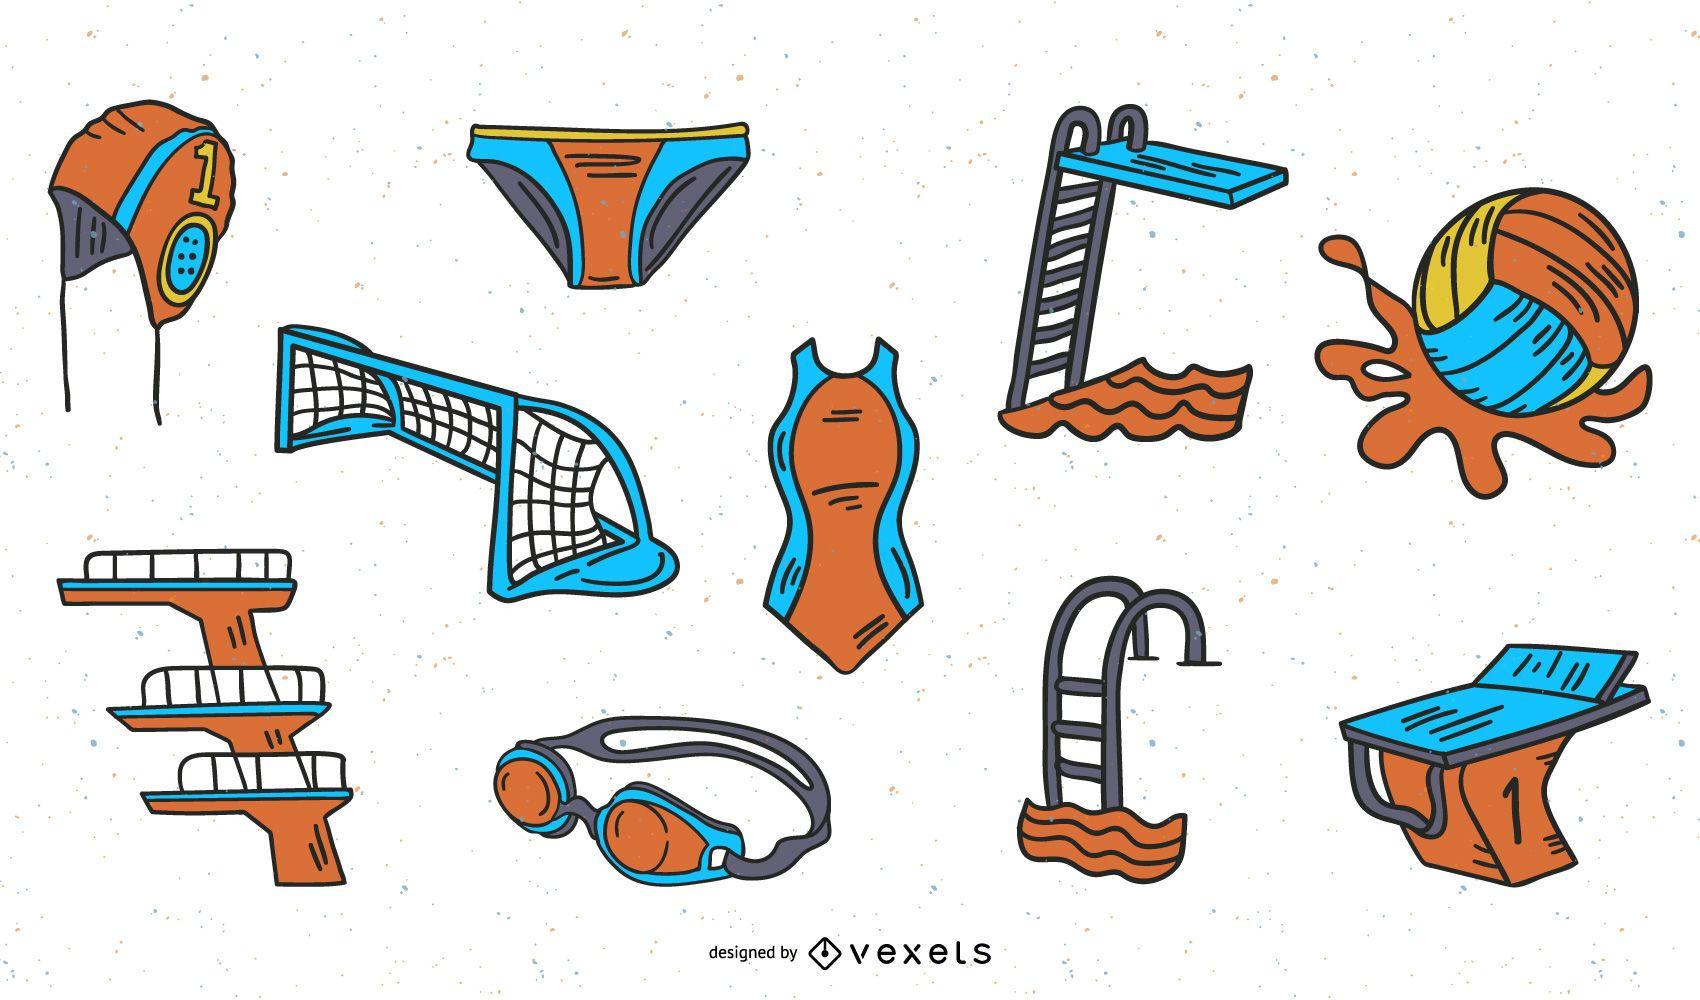 Hand Drawn Aquatic Sports Illustration Pack